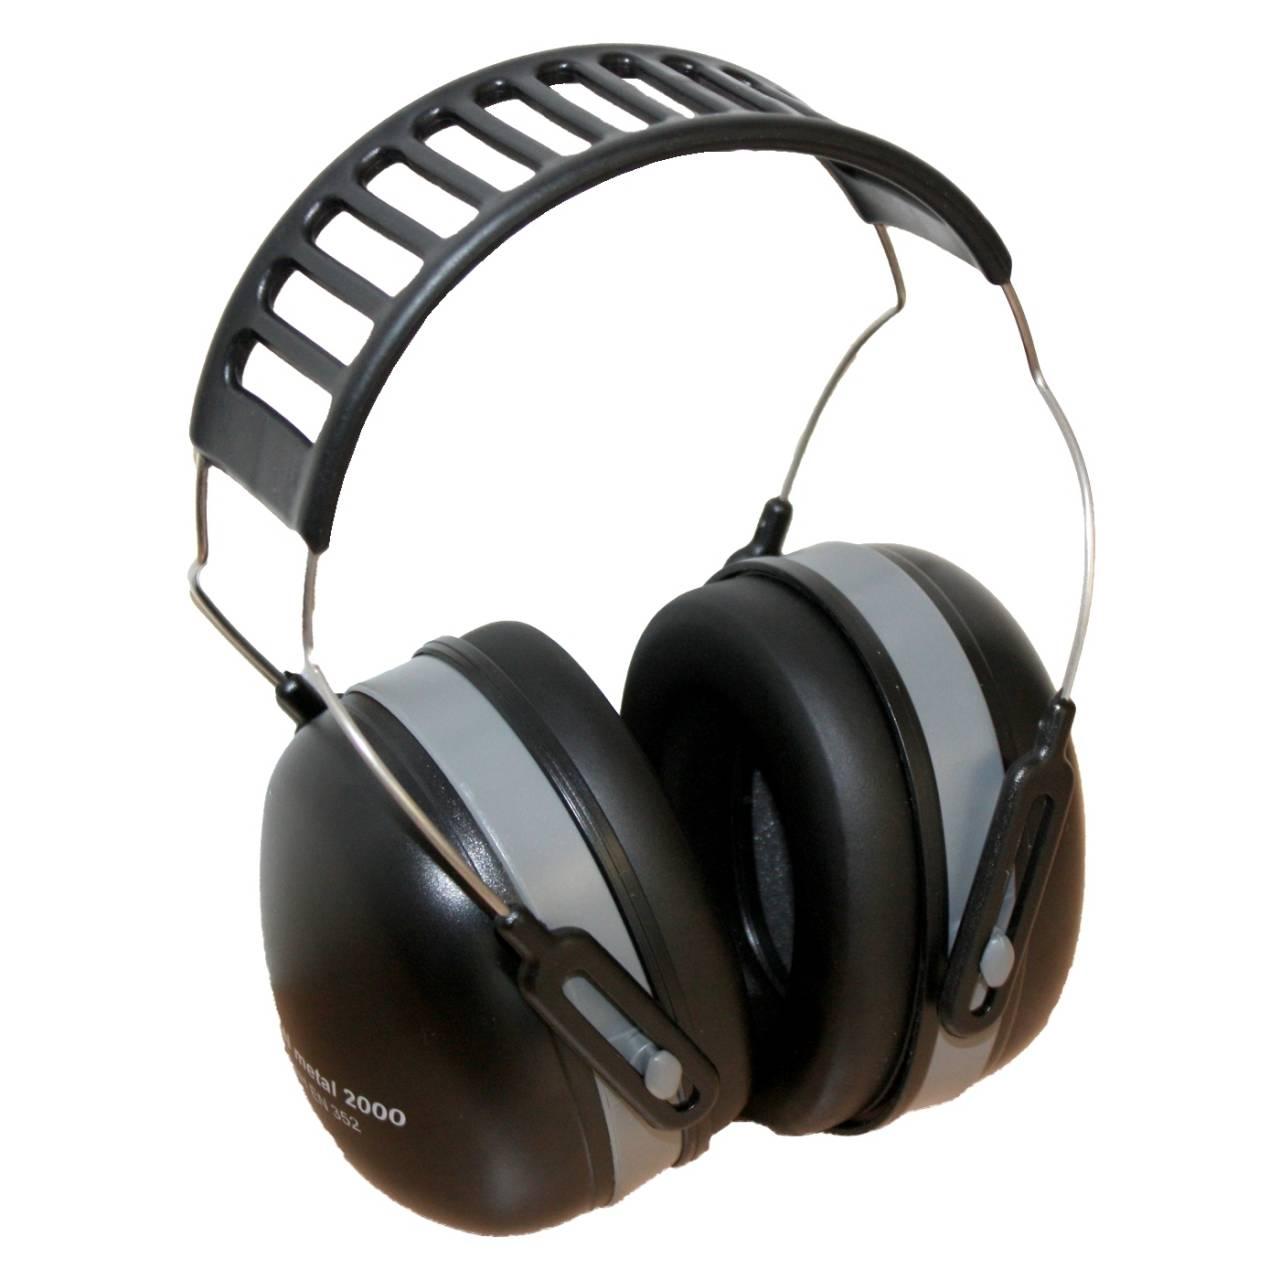 Gehörschutz-Kapsel EN352-1 'Arton Metal 2000' SNR 28 dB